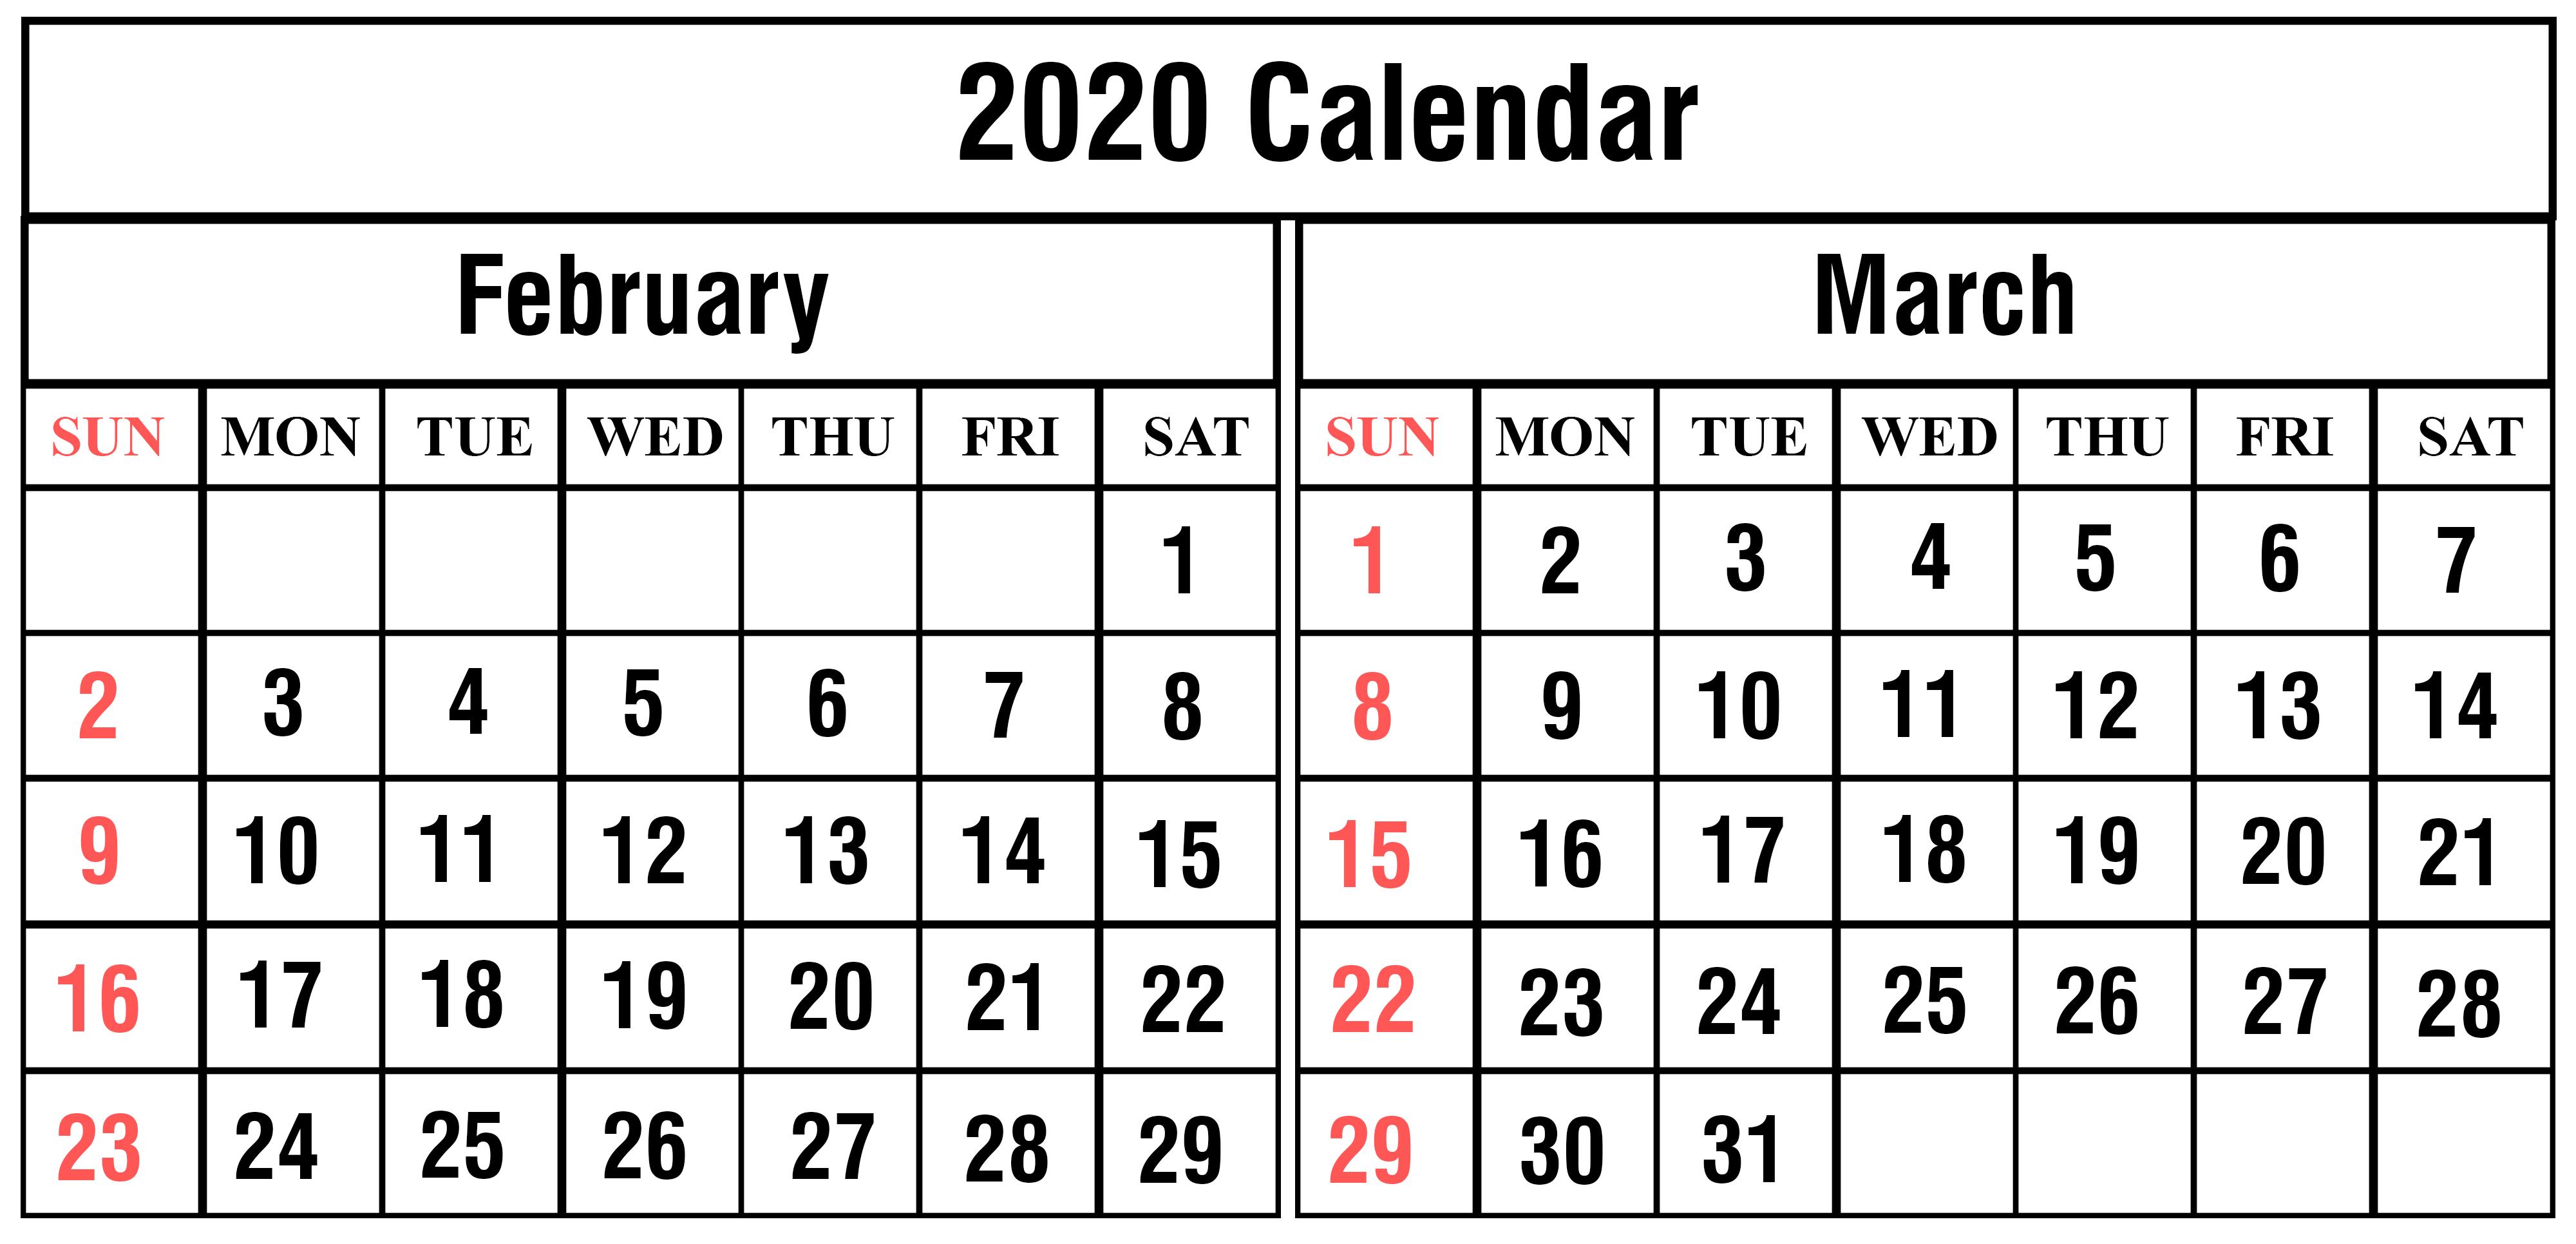 2020 Calendar February March 2020